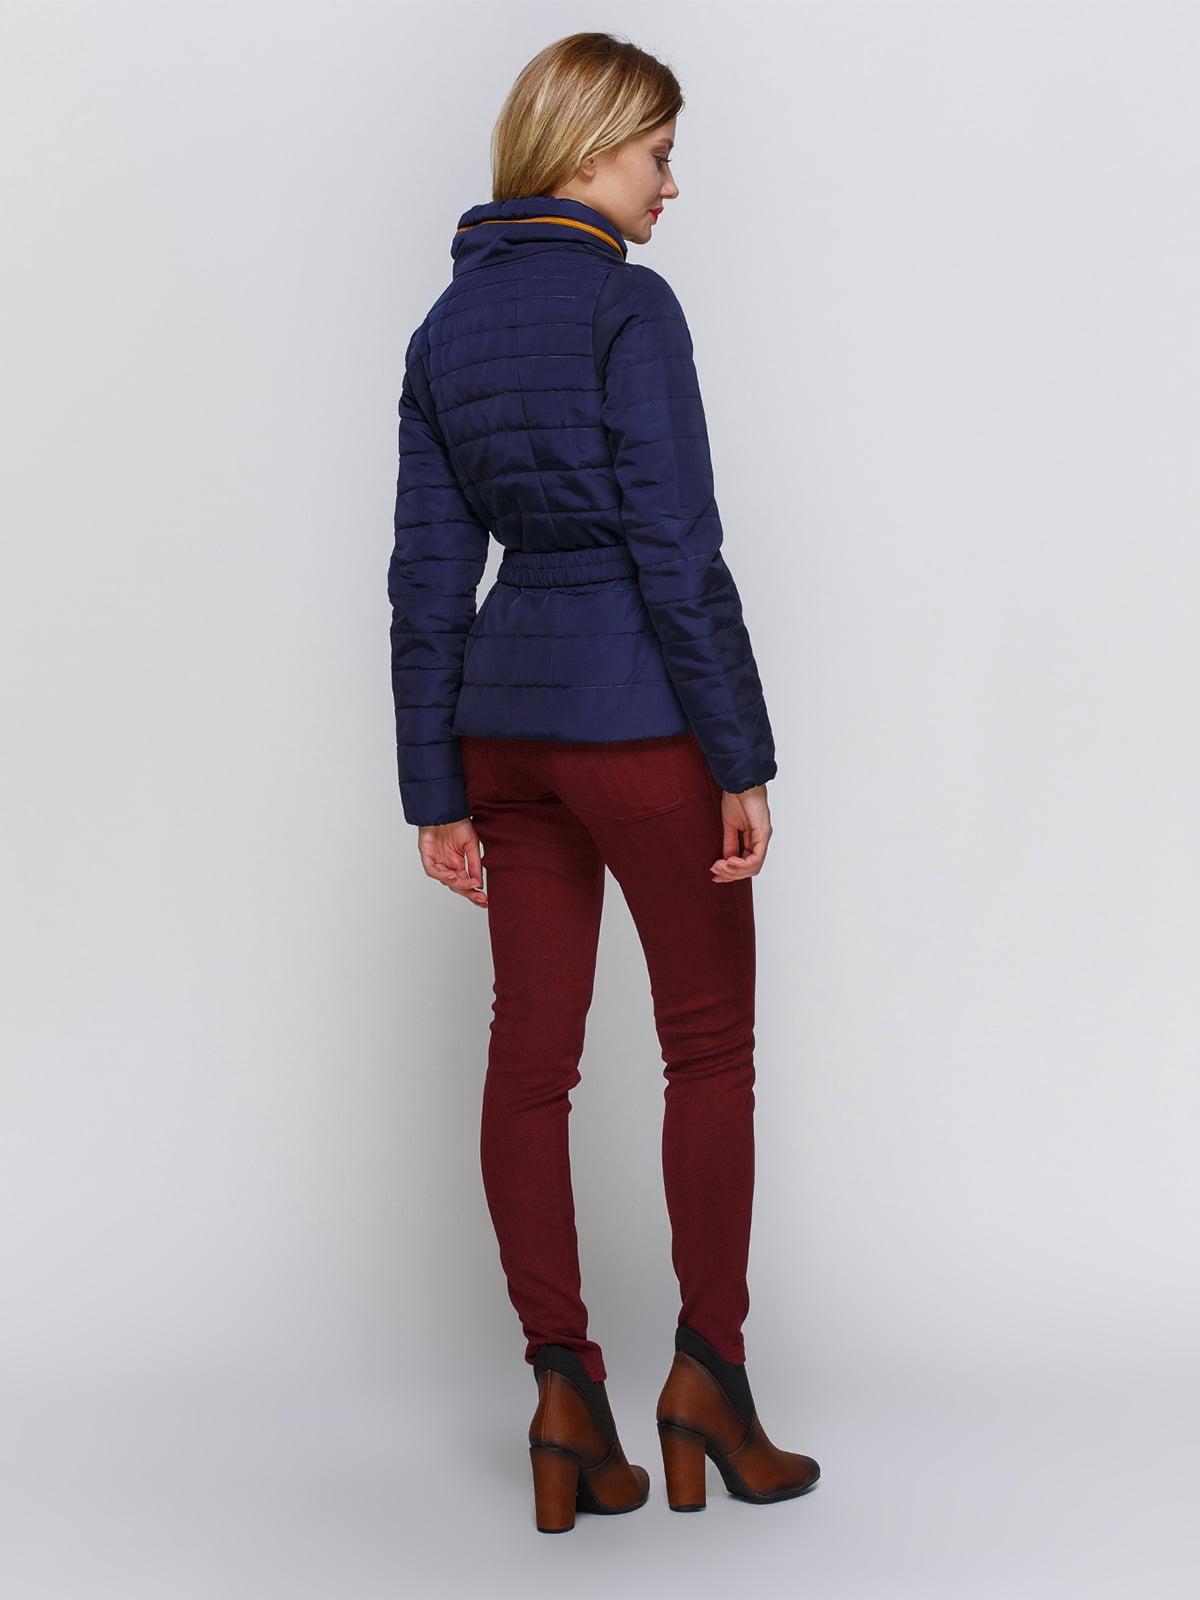 Куртка темно-синяя   2127860   фото 3